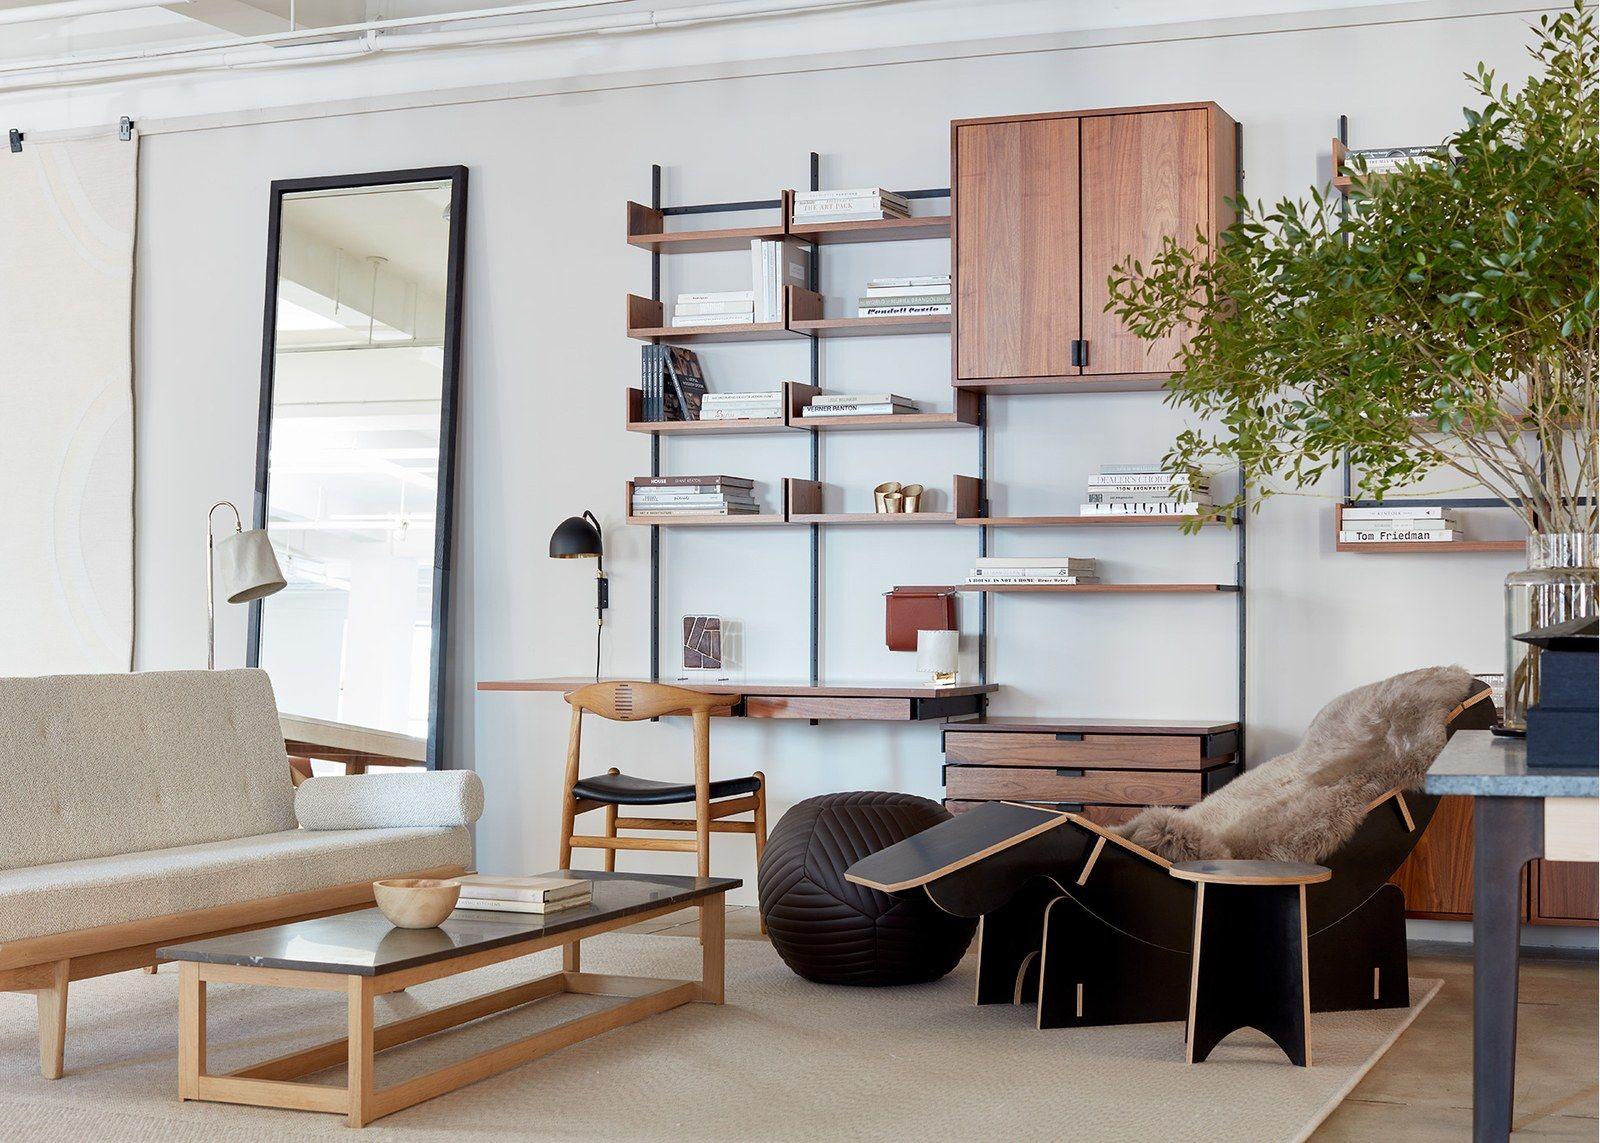 As4 Modular Furniture System In The Fair Showroom Mod